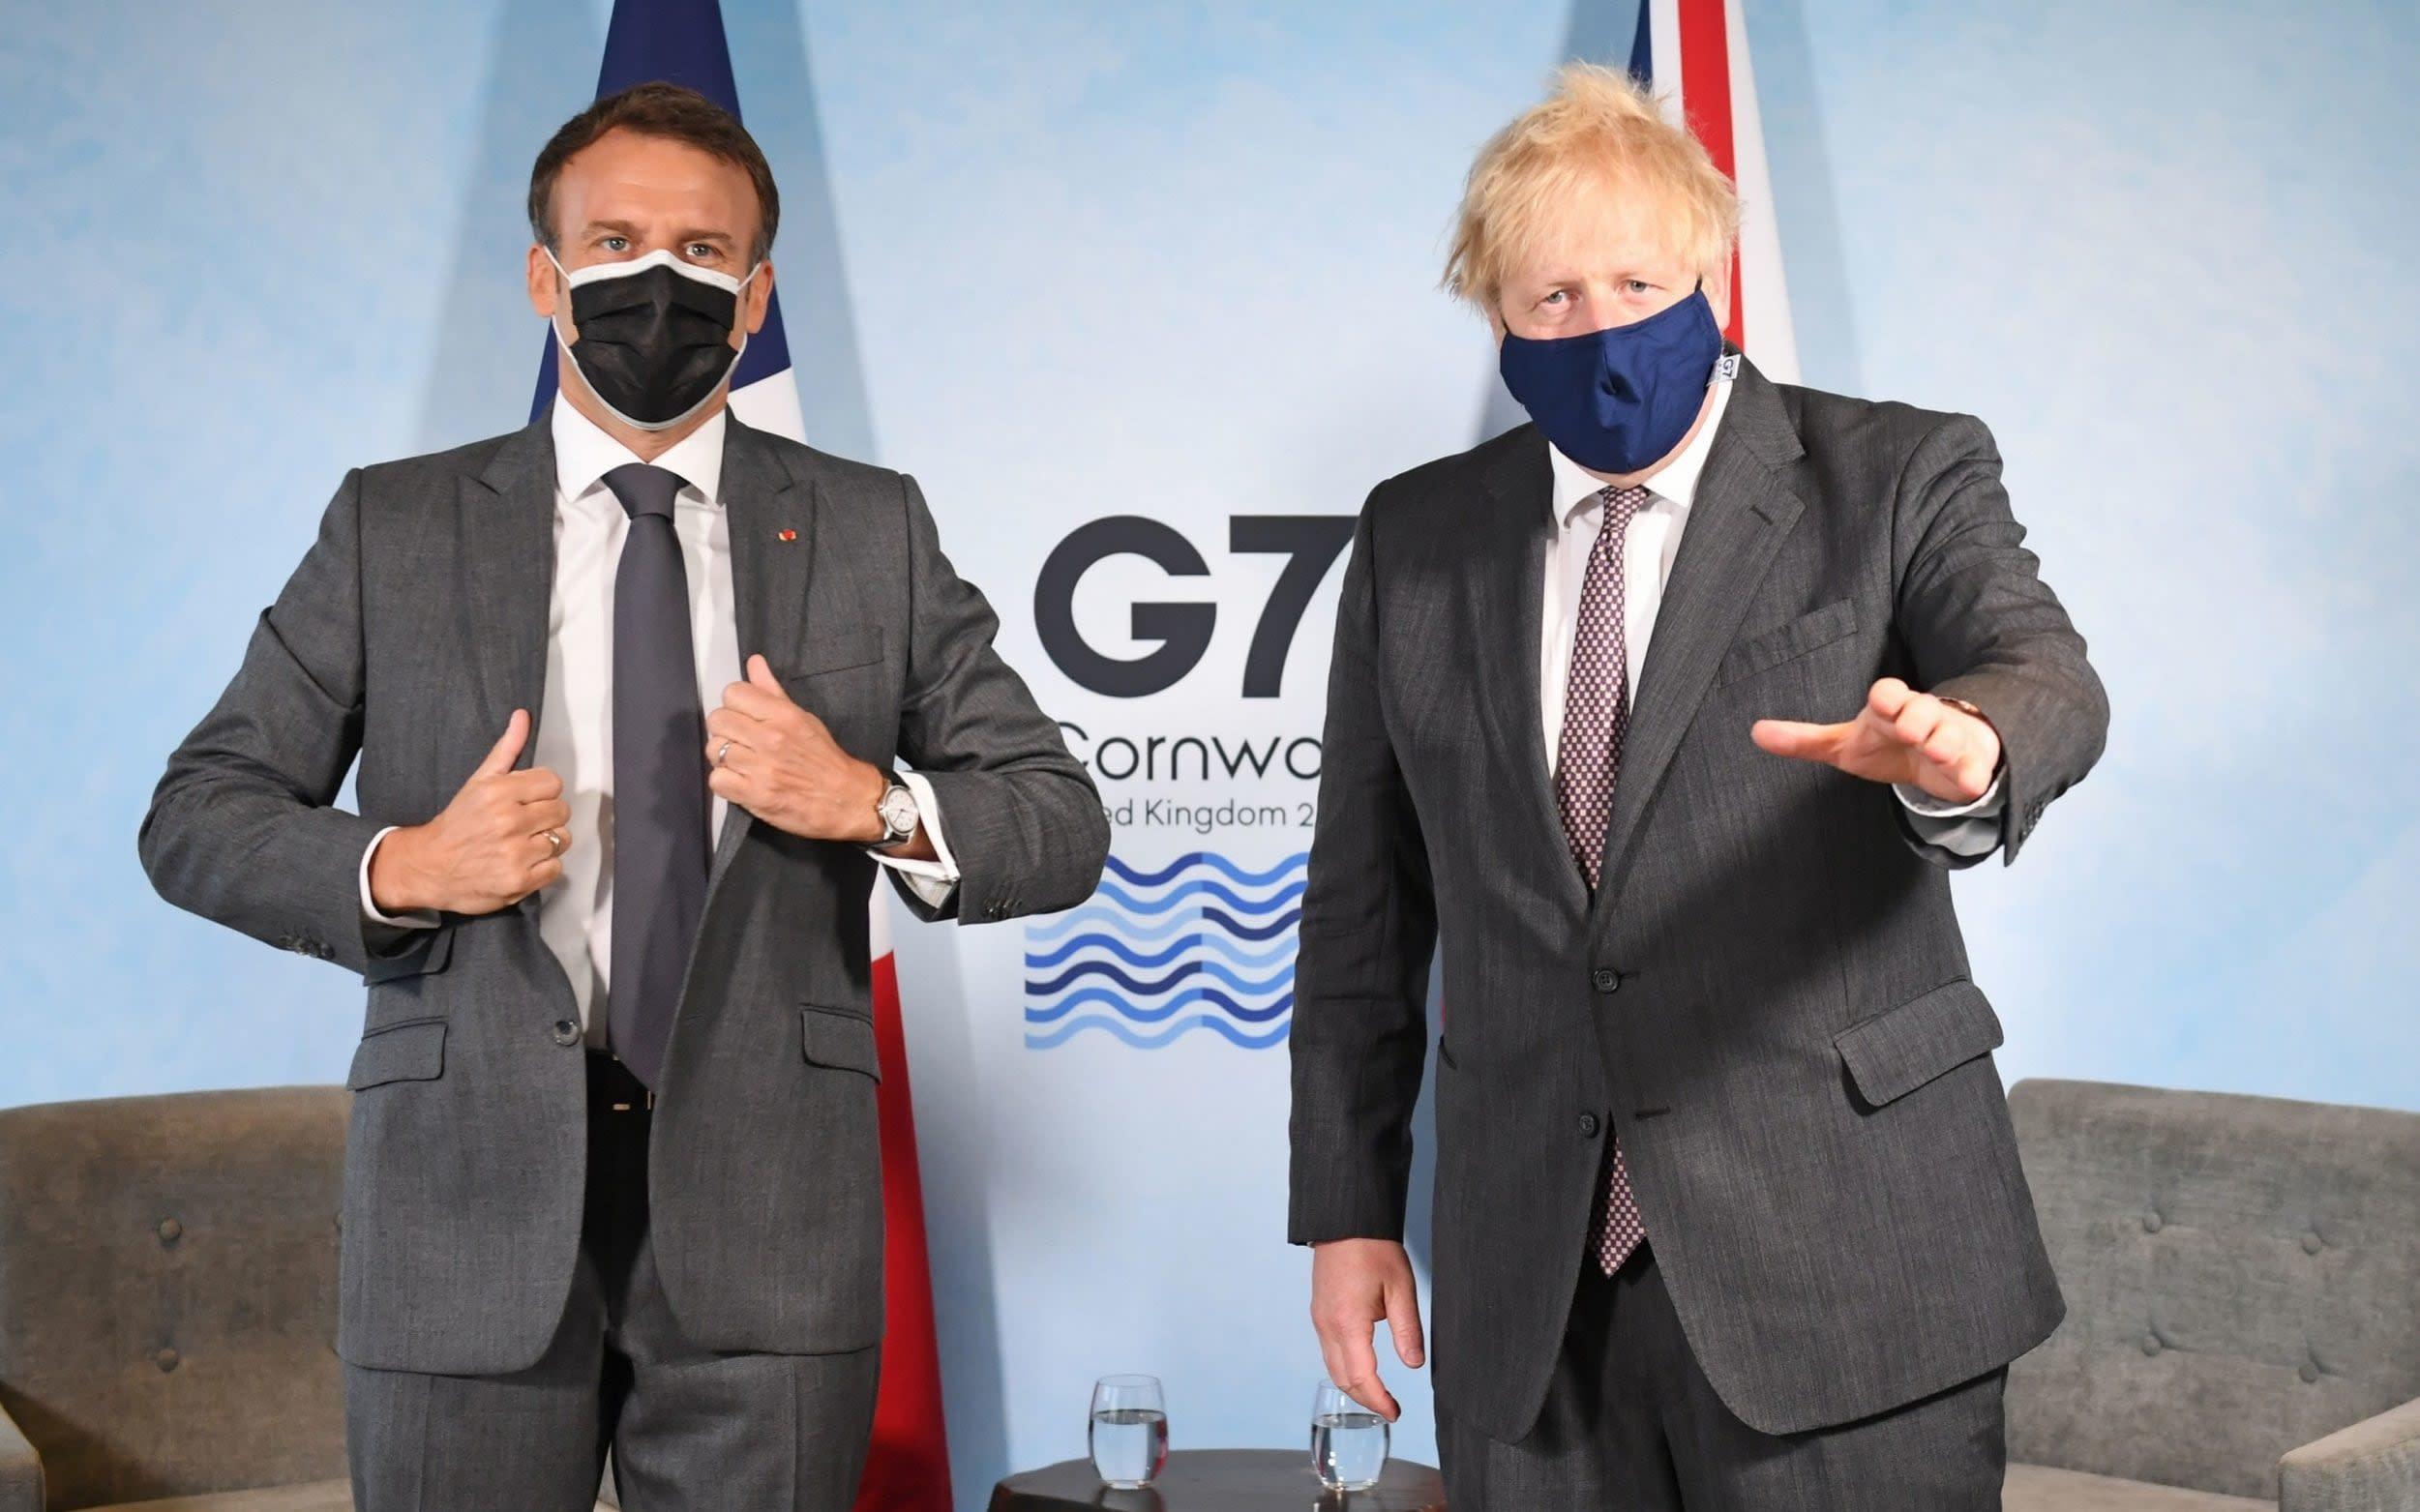 Boris Johnson's warning to EU: 'I will not hesitate to take unilateral measures over Northern Ireland'